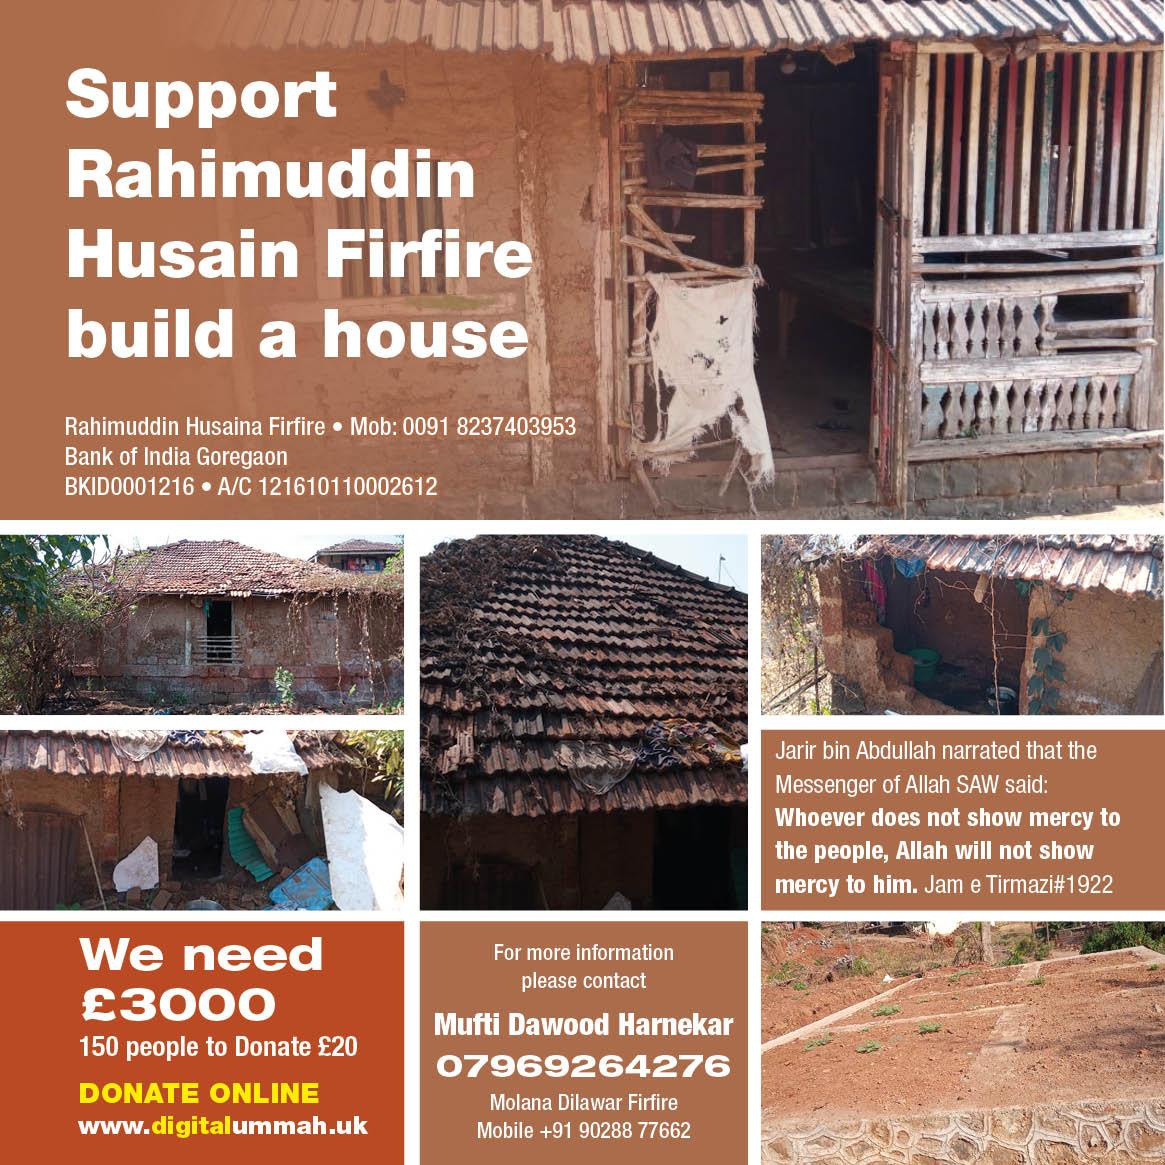 Support Rahimuddin Husaina Firfire build a house